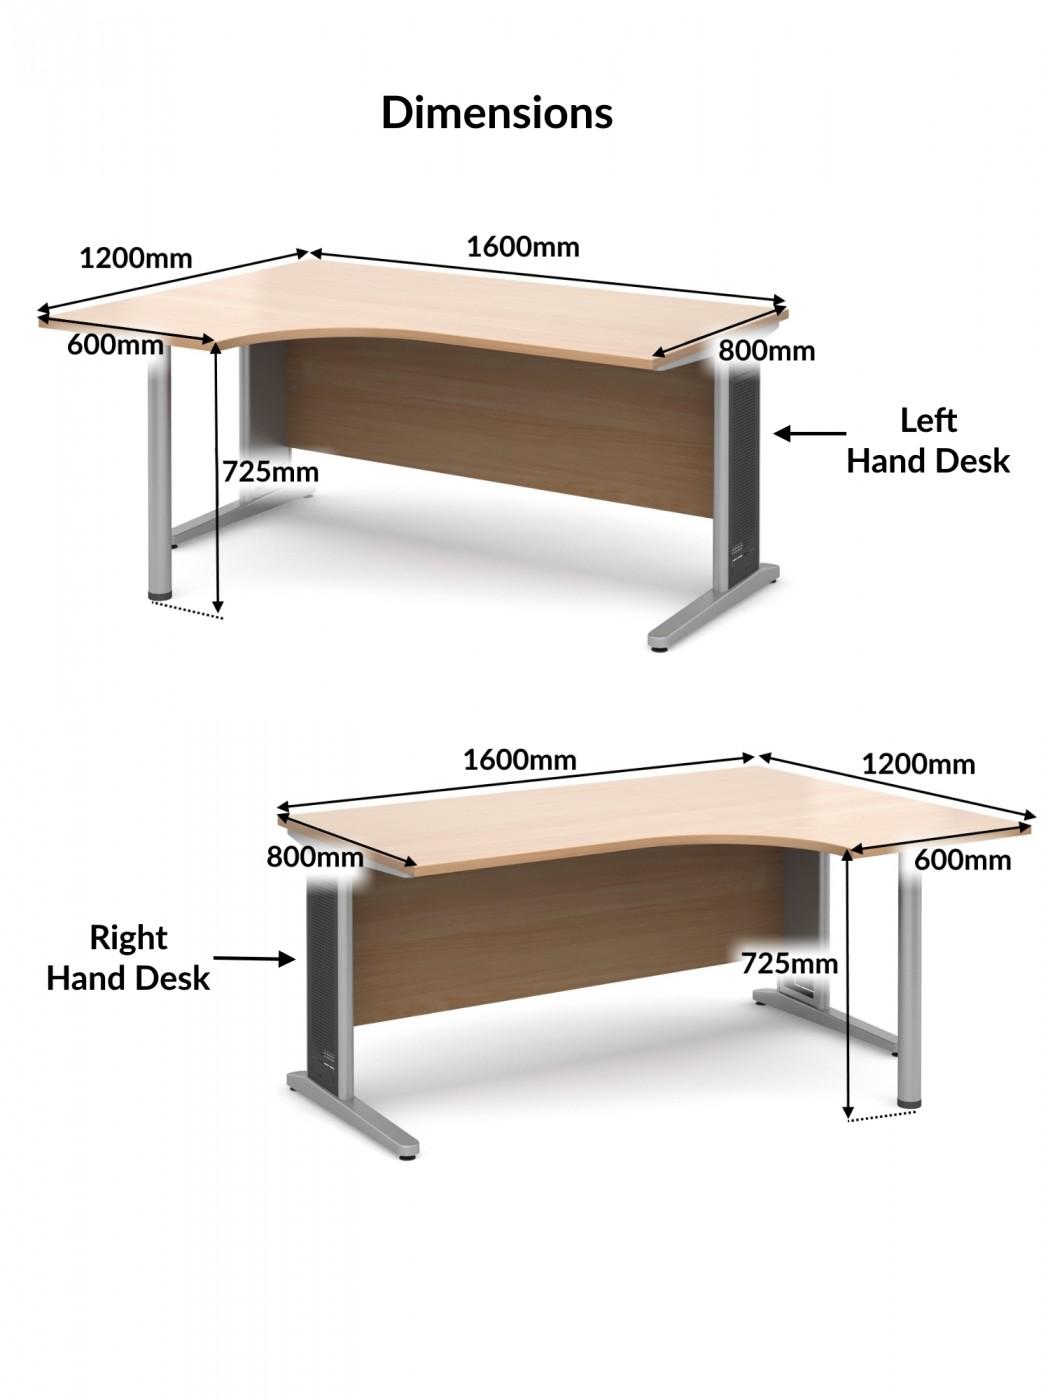 largo 1600mm wide ergonomic desk lel16 ler16 121 office